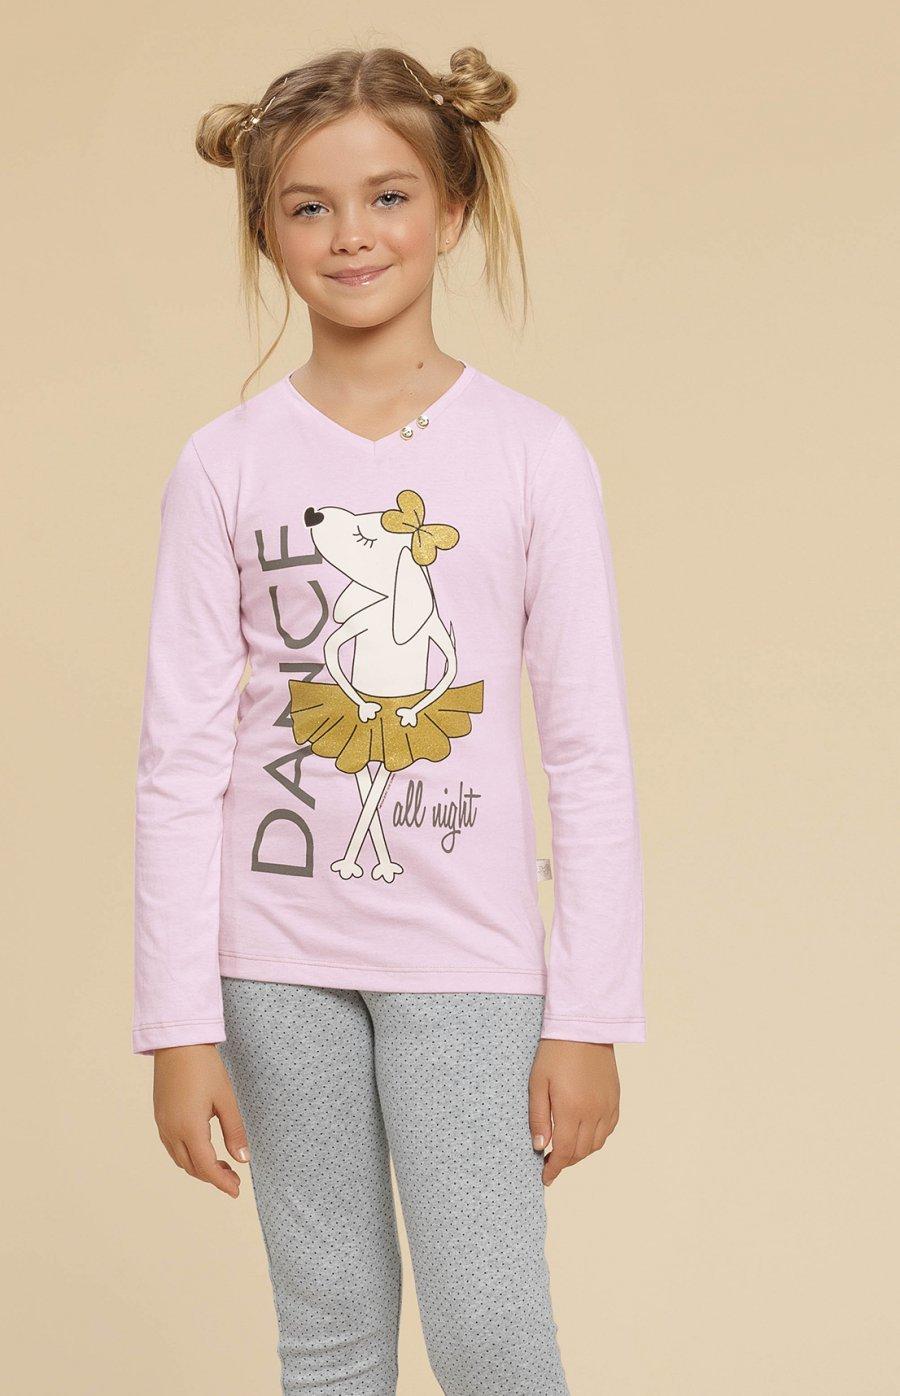 Pijama Infantil Legging Dog Ballet Inverno 2019 - Pré-Venda CLOUD CLUB